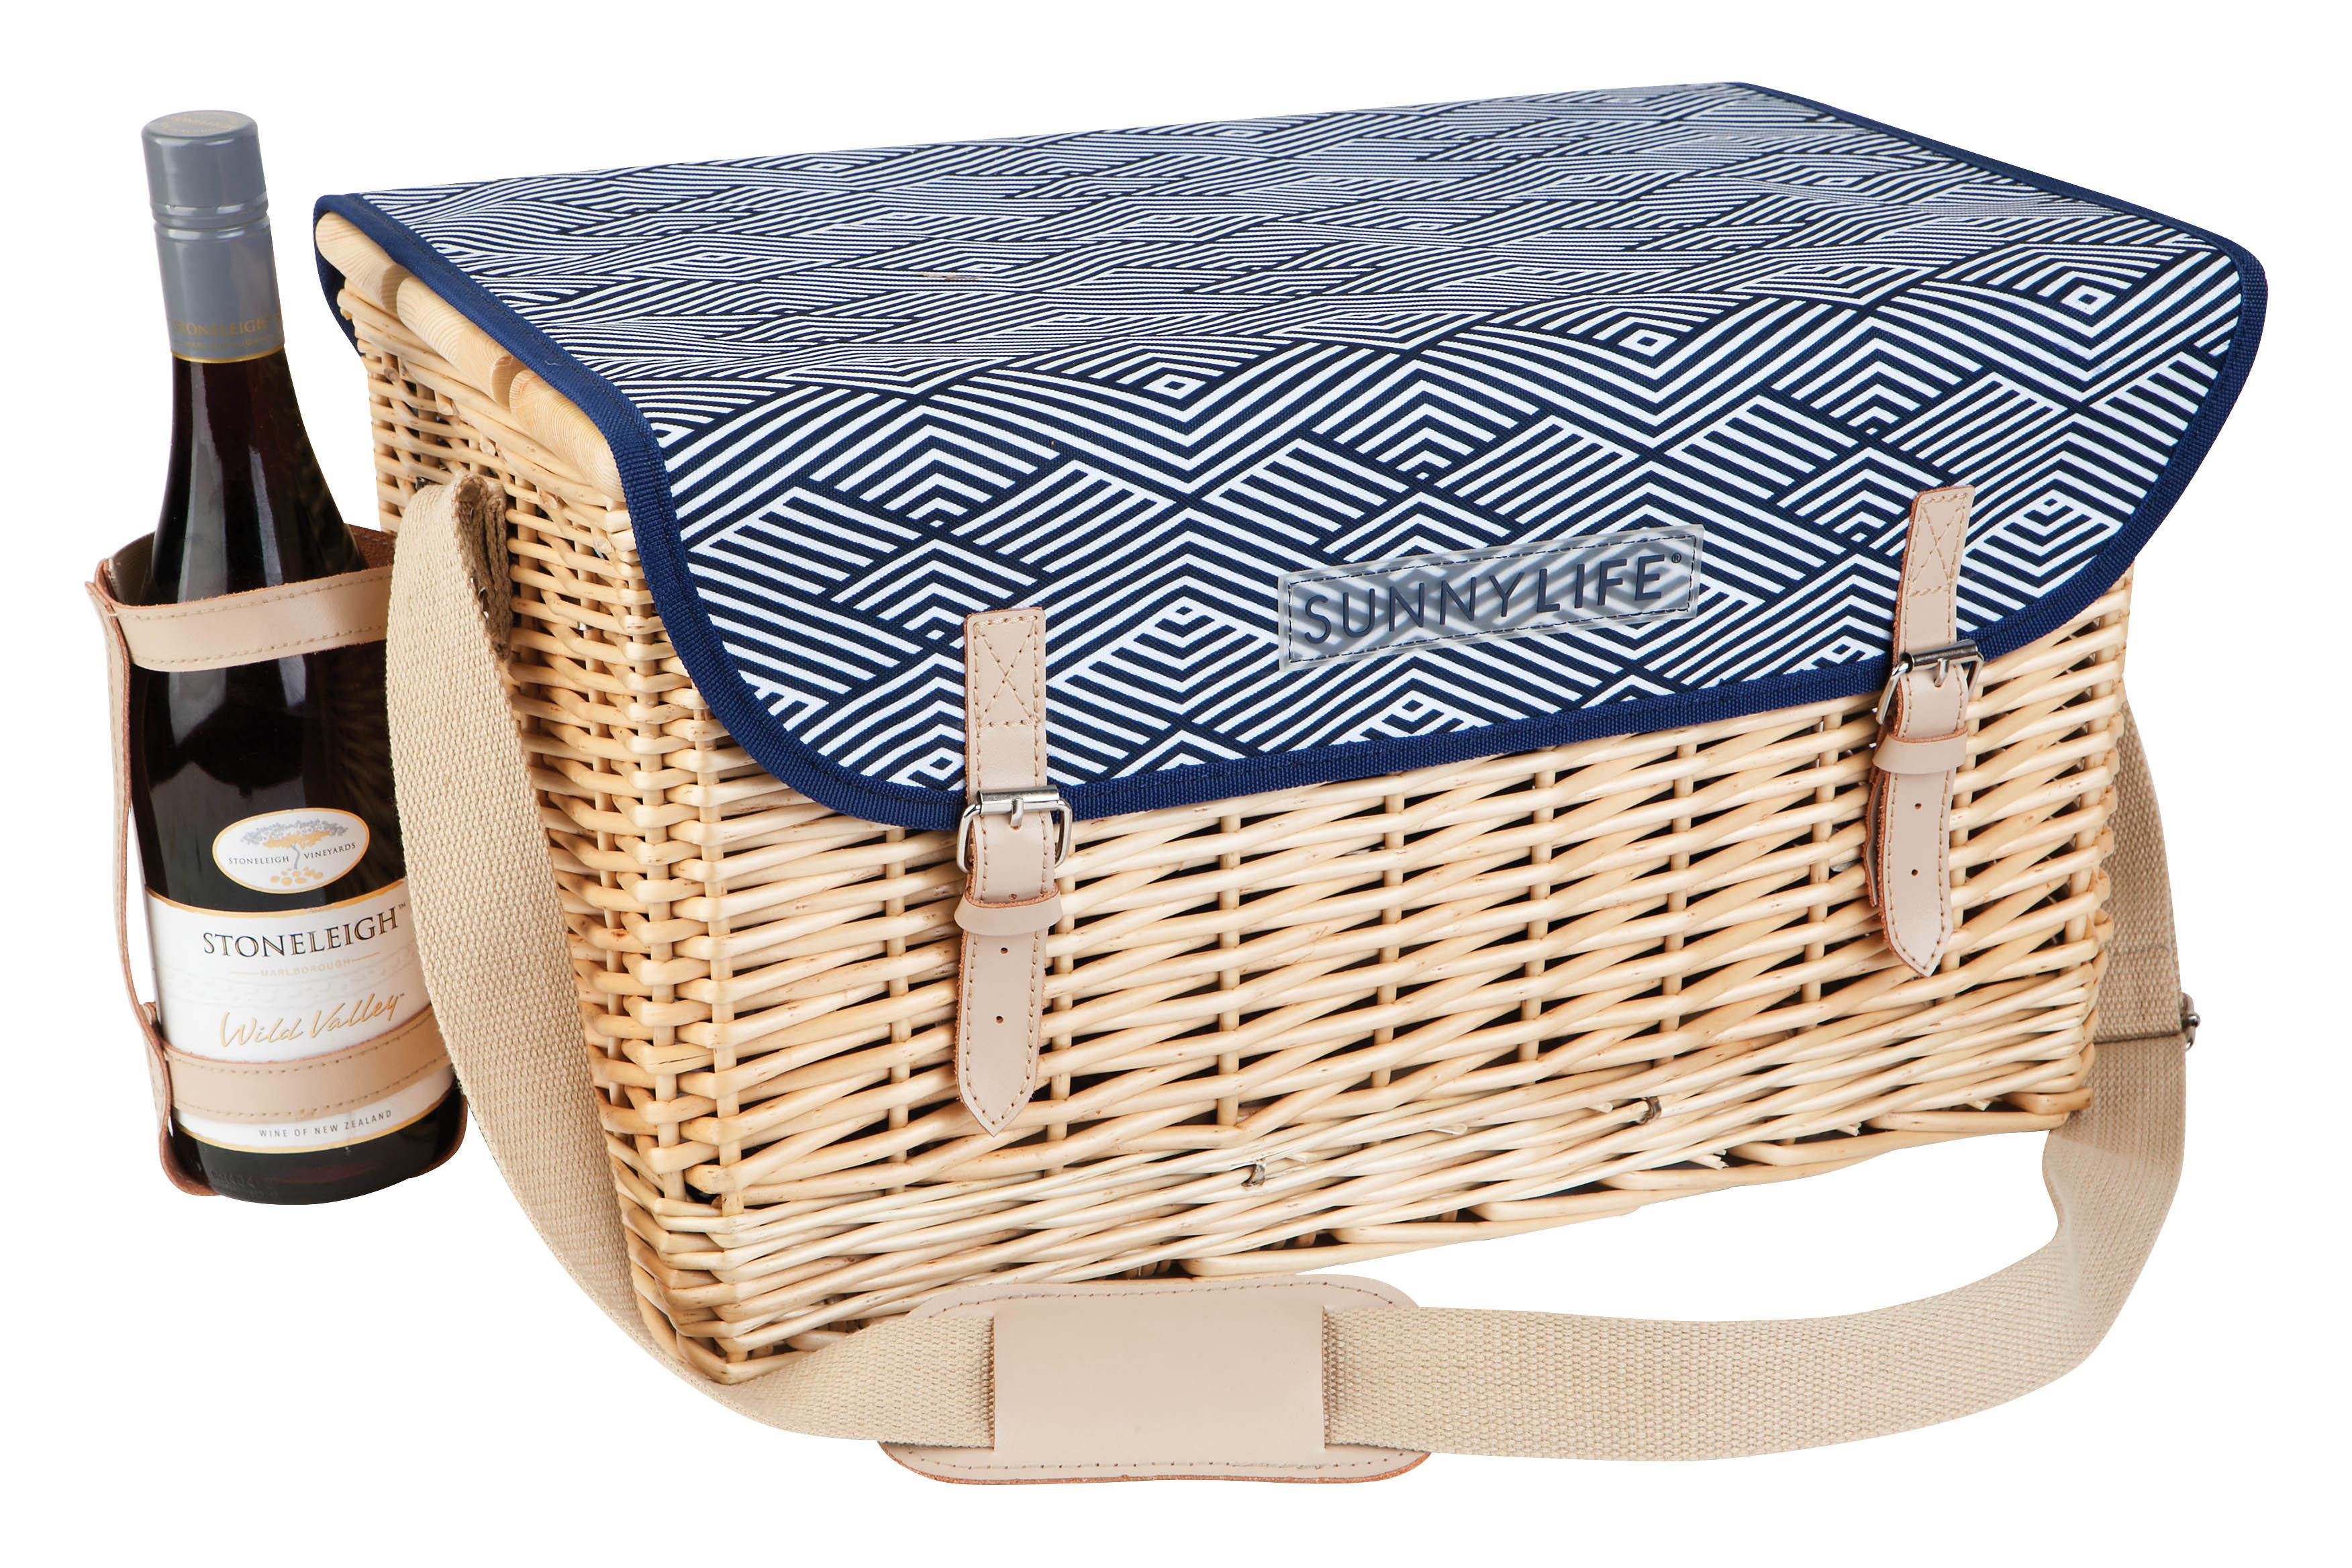 montauk panier pique nique blue by sunnylife. Black Bedroom Furniture Sets. Home Design Ideas